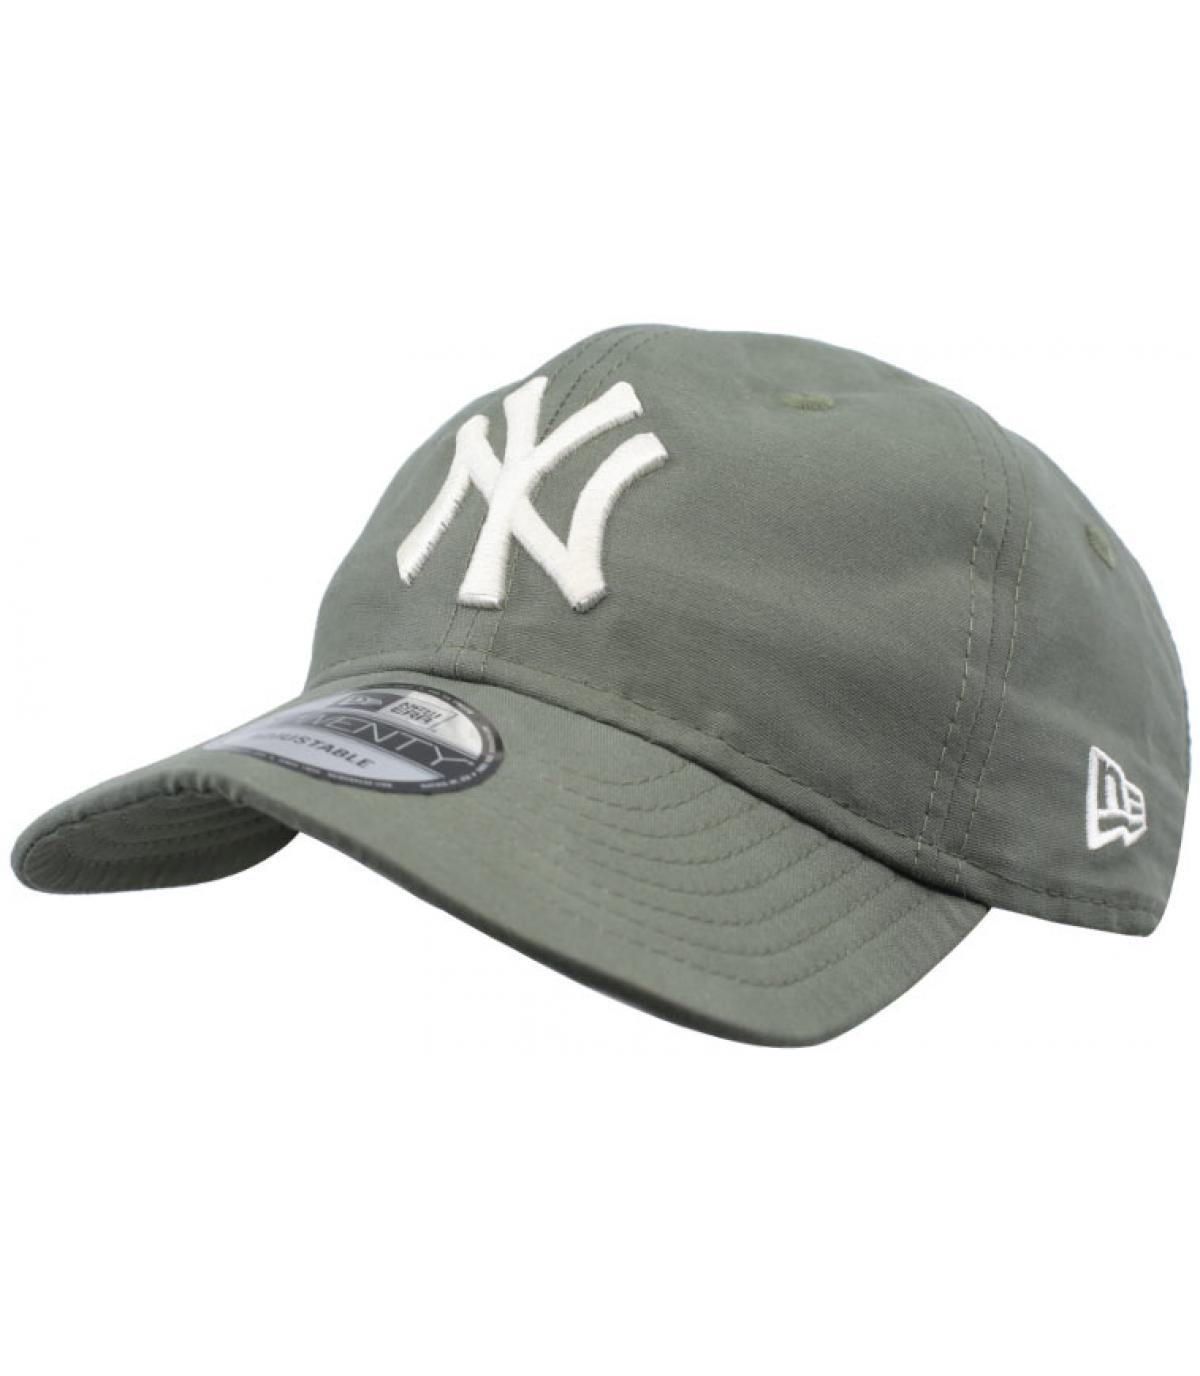 green packable NY cap - Light Wight Nylon Packable 9Twenty NY olive ... 394843bfc7c